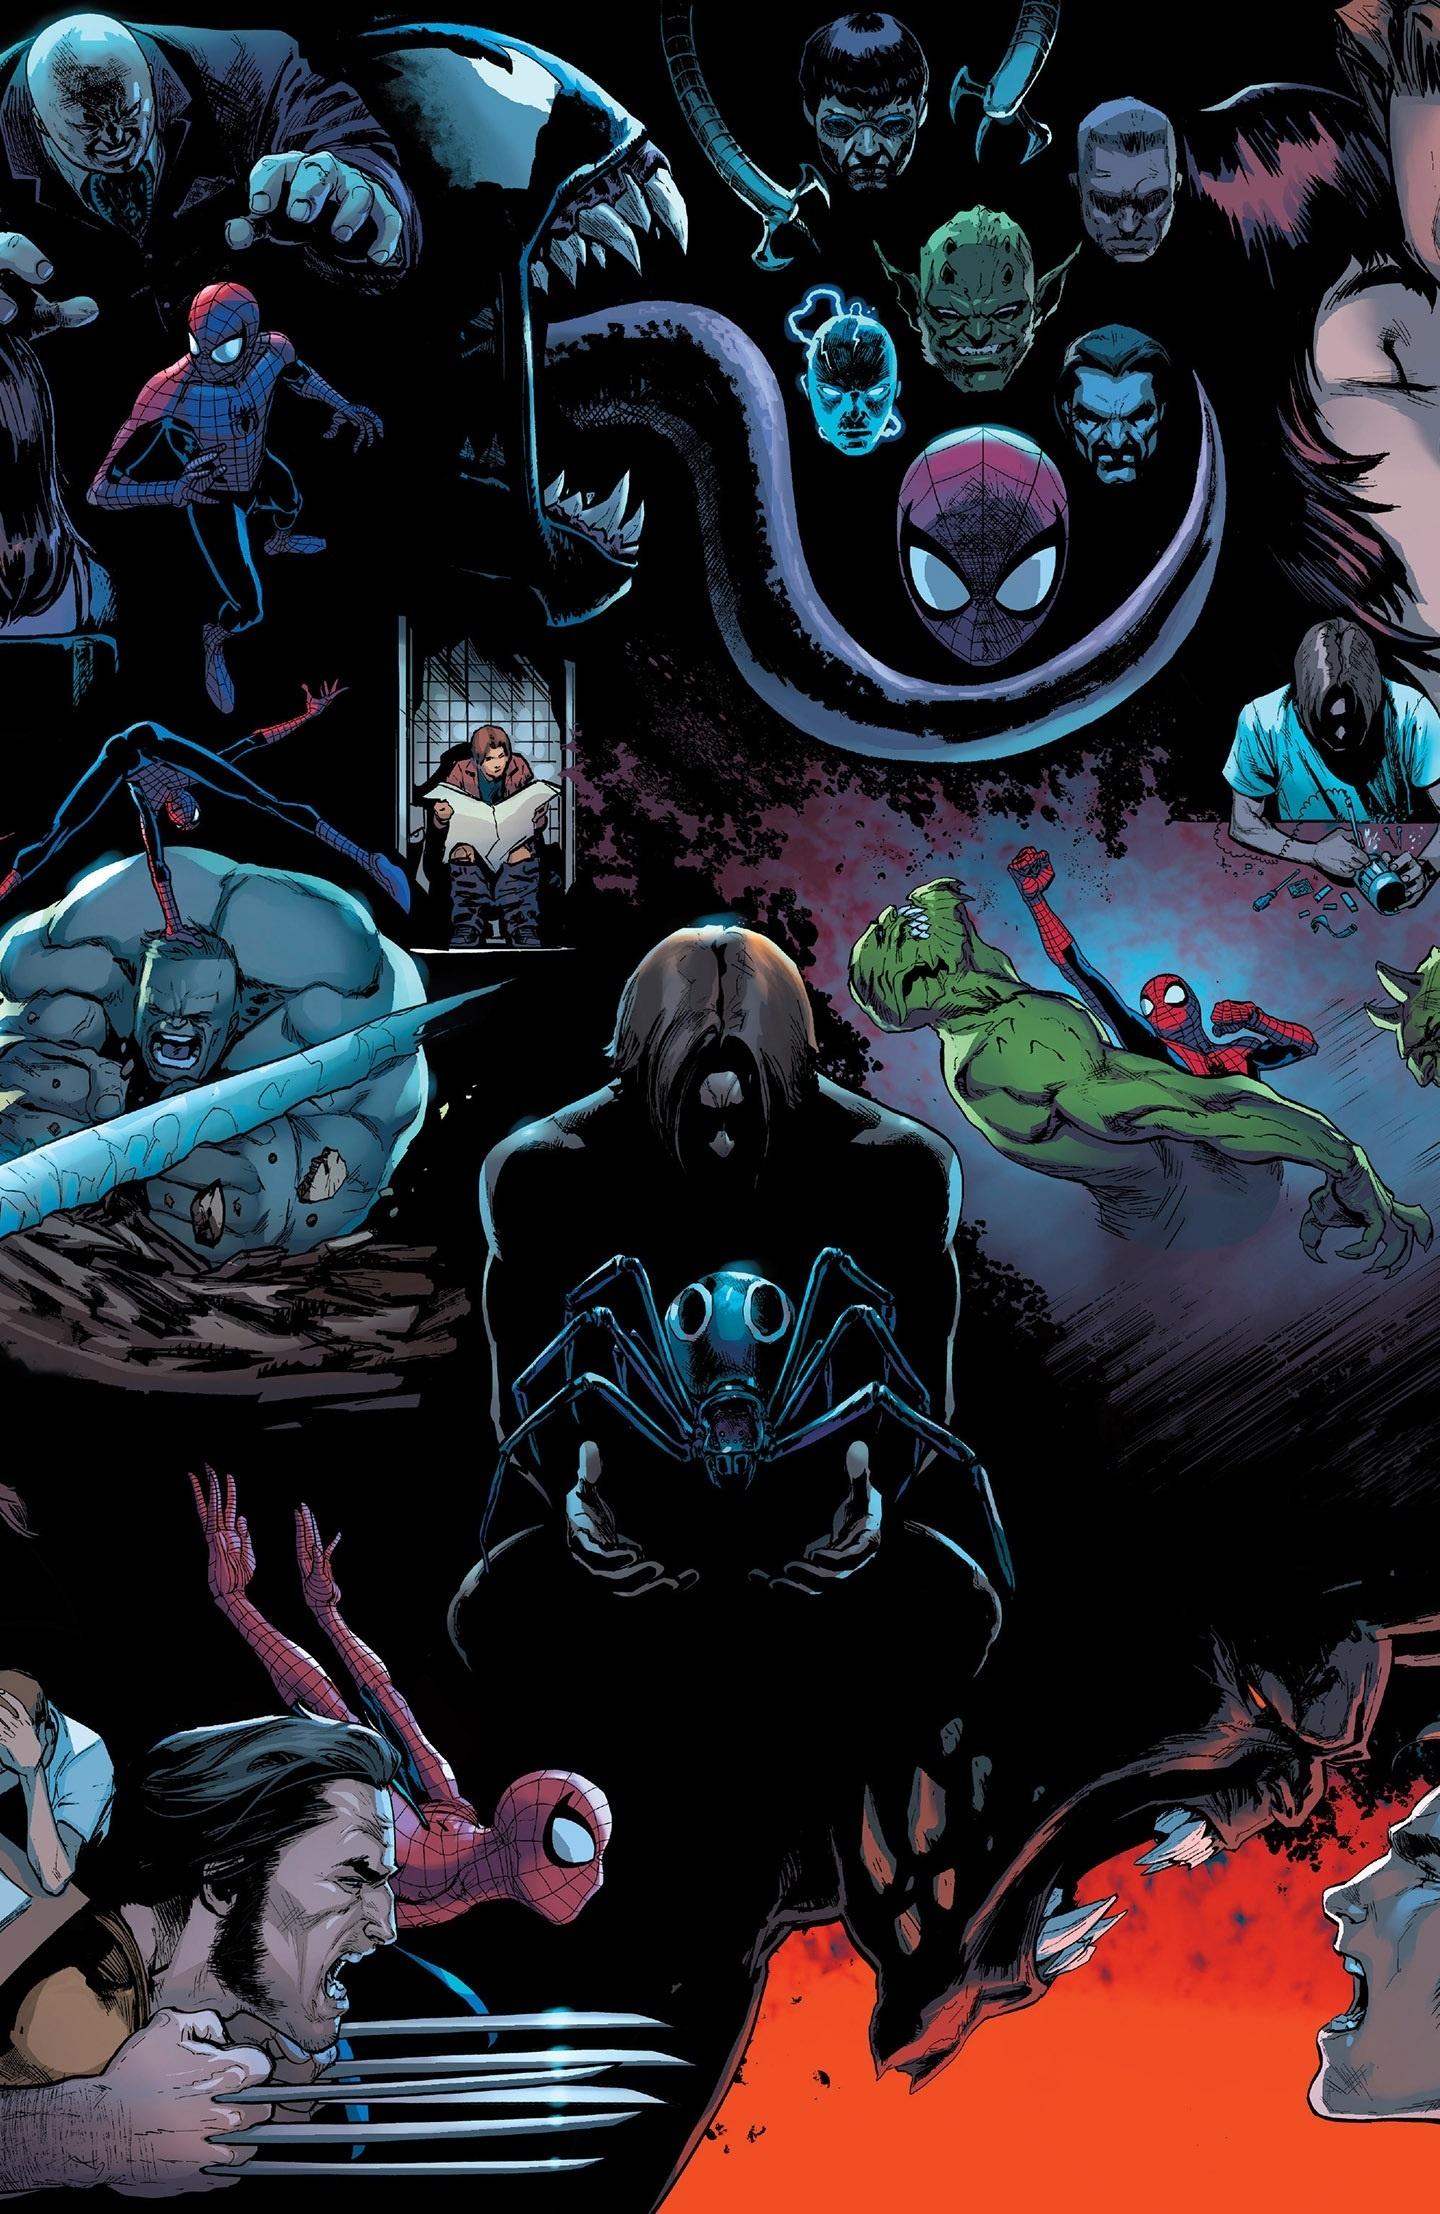 Download 1440x2880 Wallpaper Spider Man Marvel Comics Dark Lg